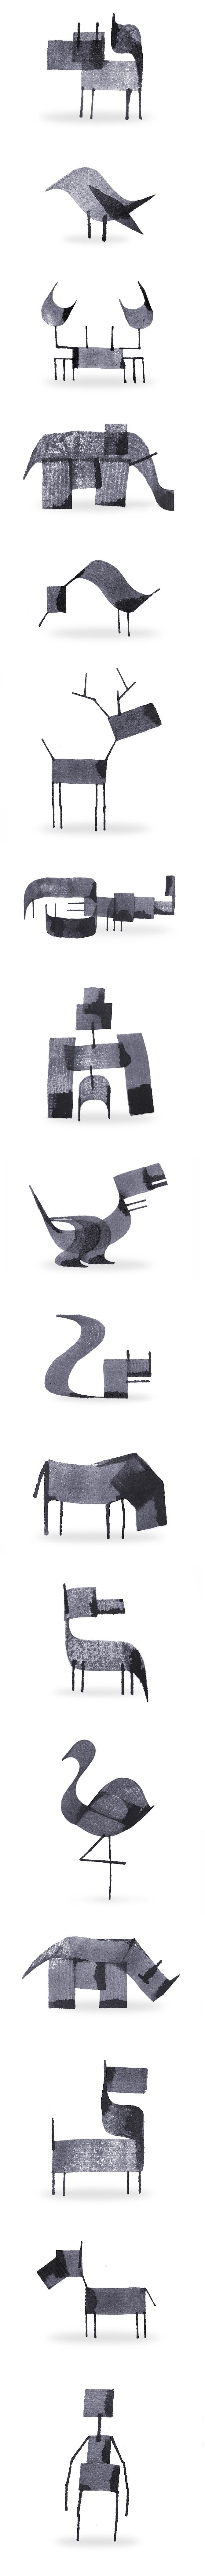 animal-minimaliste-caligraphie-02